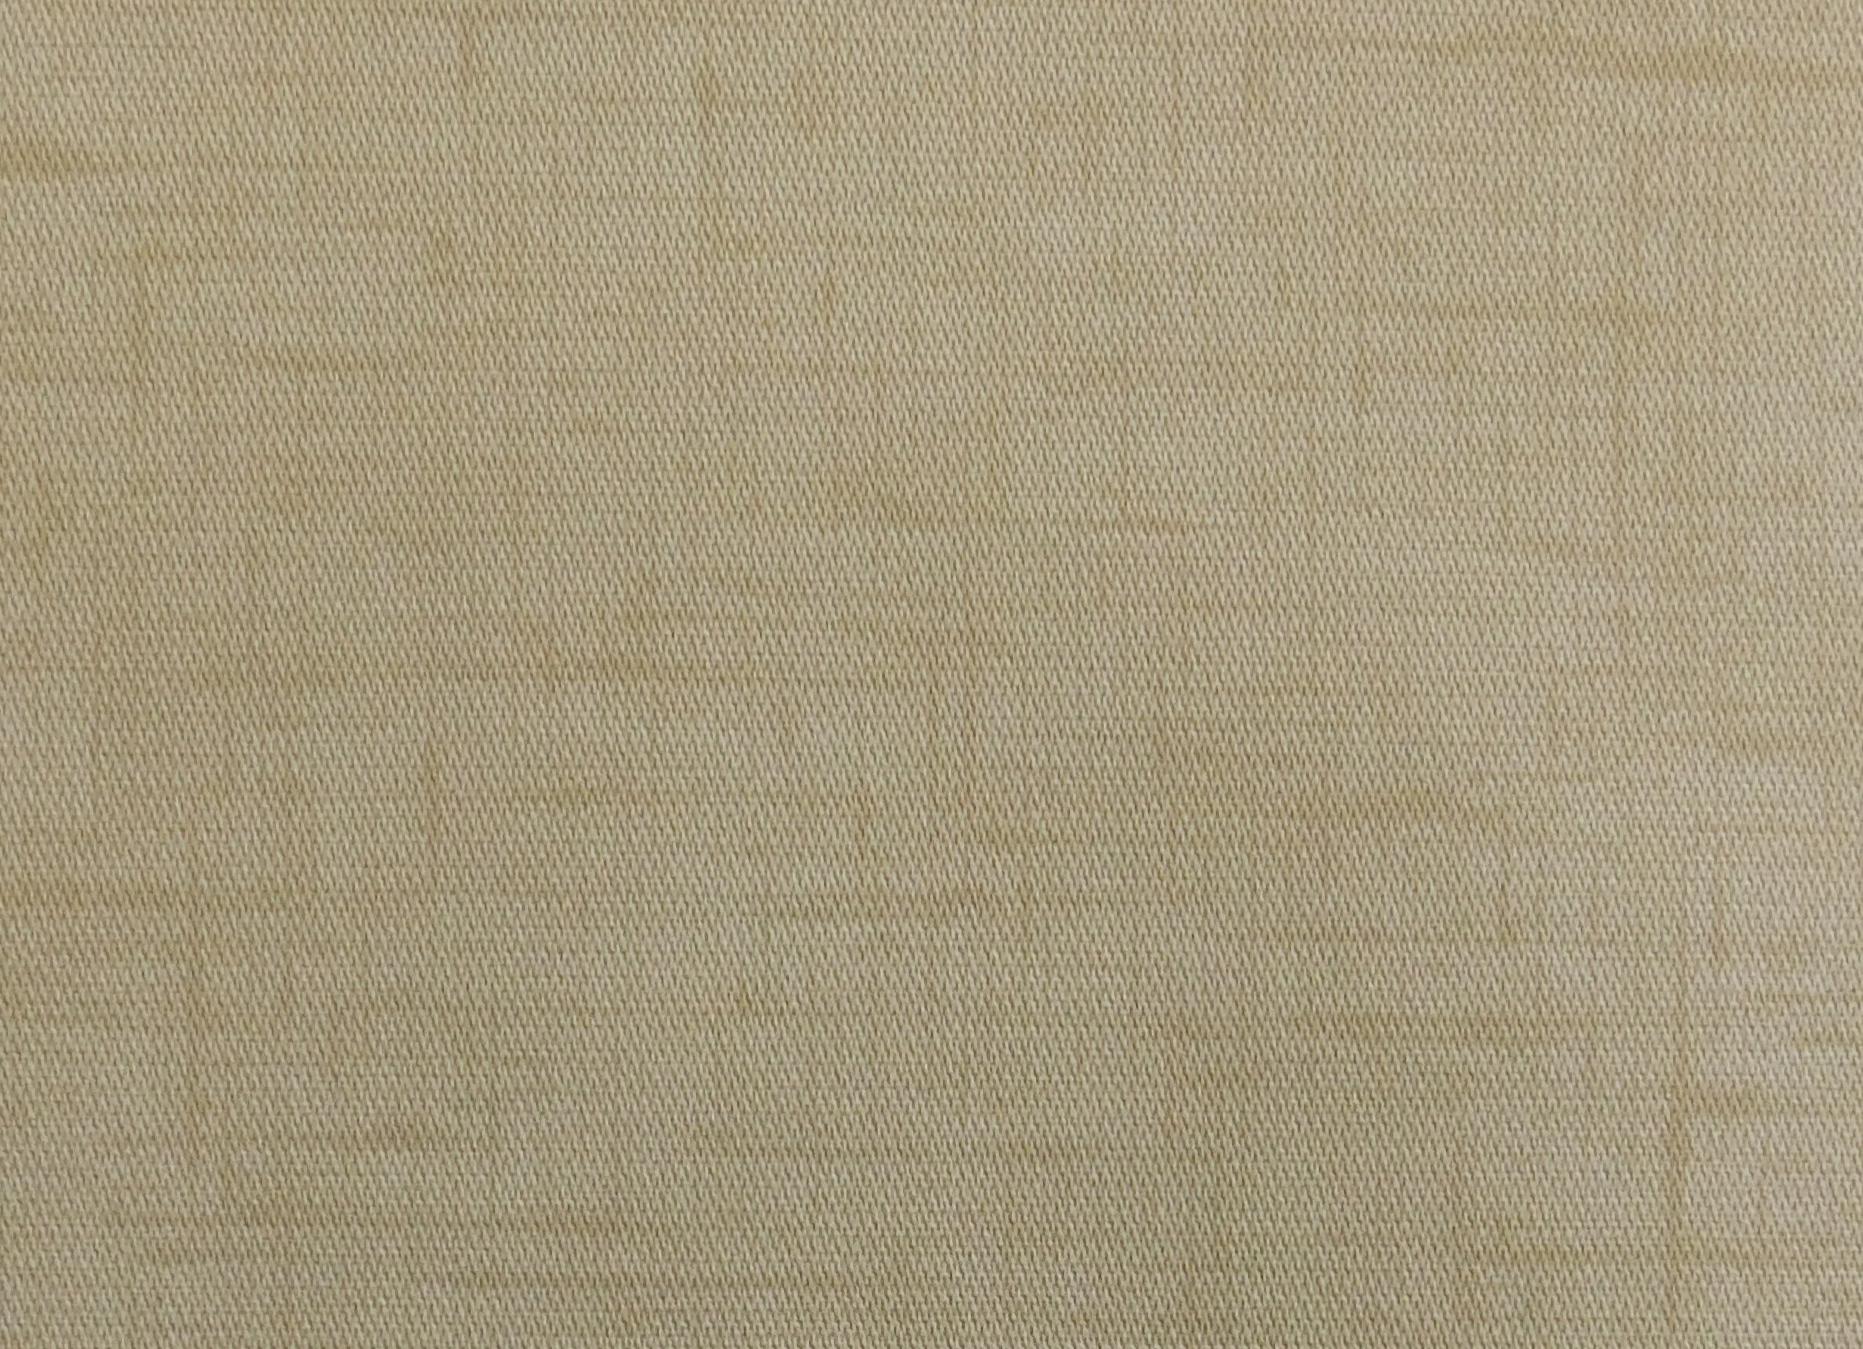 Spectrum Hay Bale FR BO Blind Fabric RA